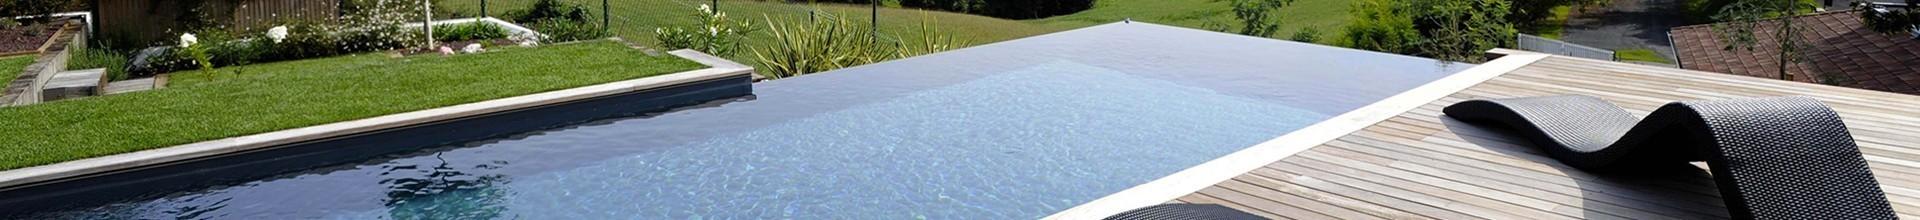 Constructeur piscine discount Pays : Luxembourg